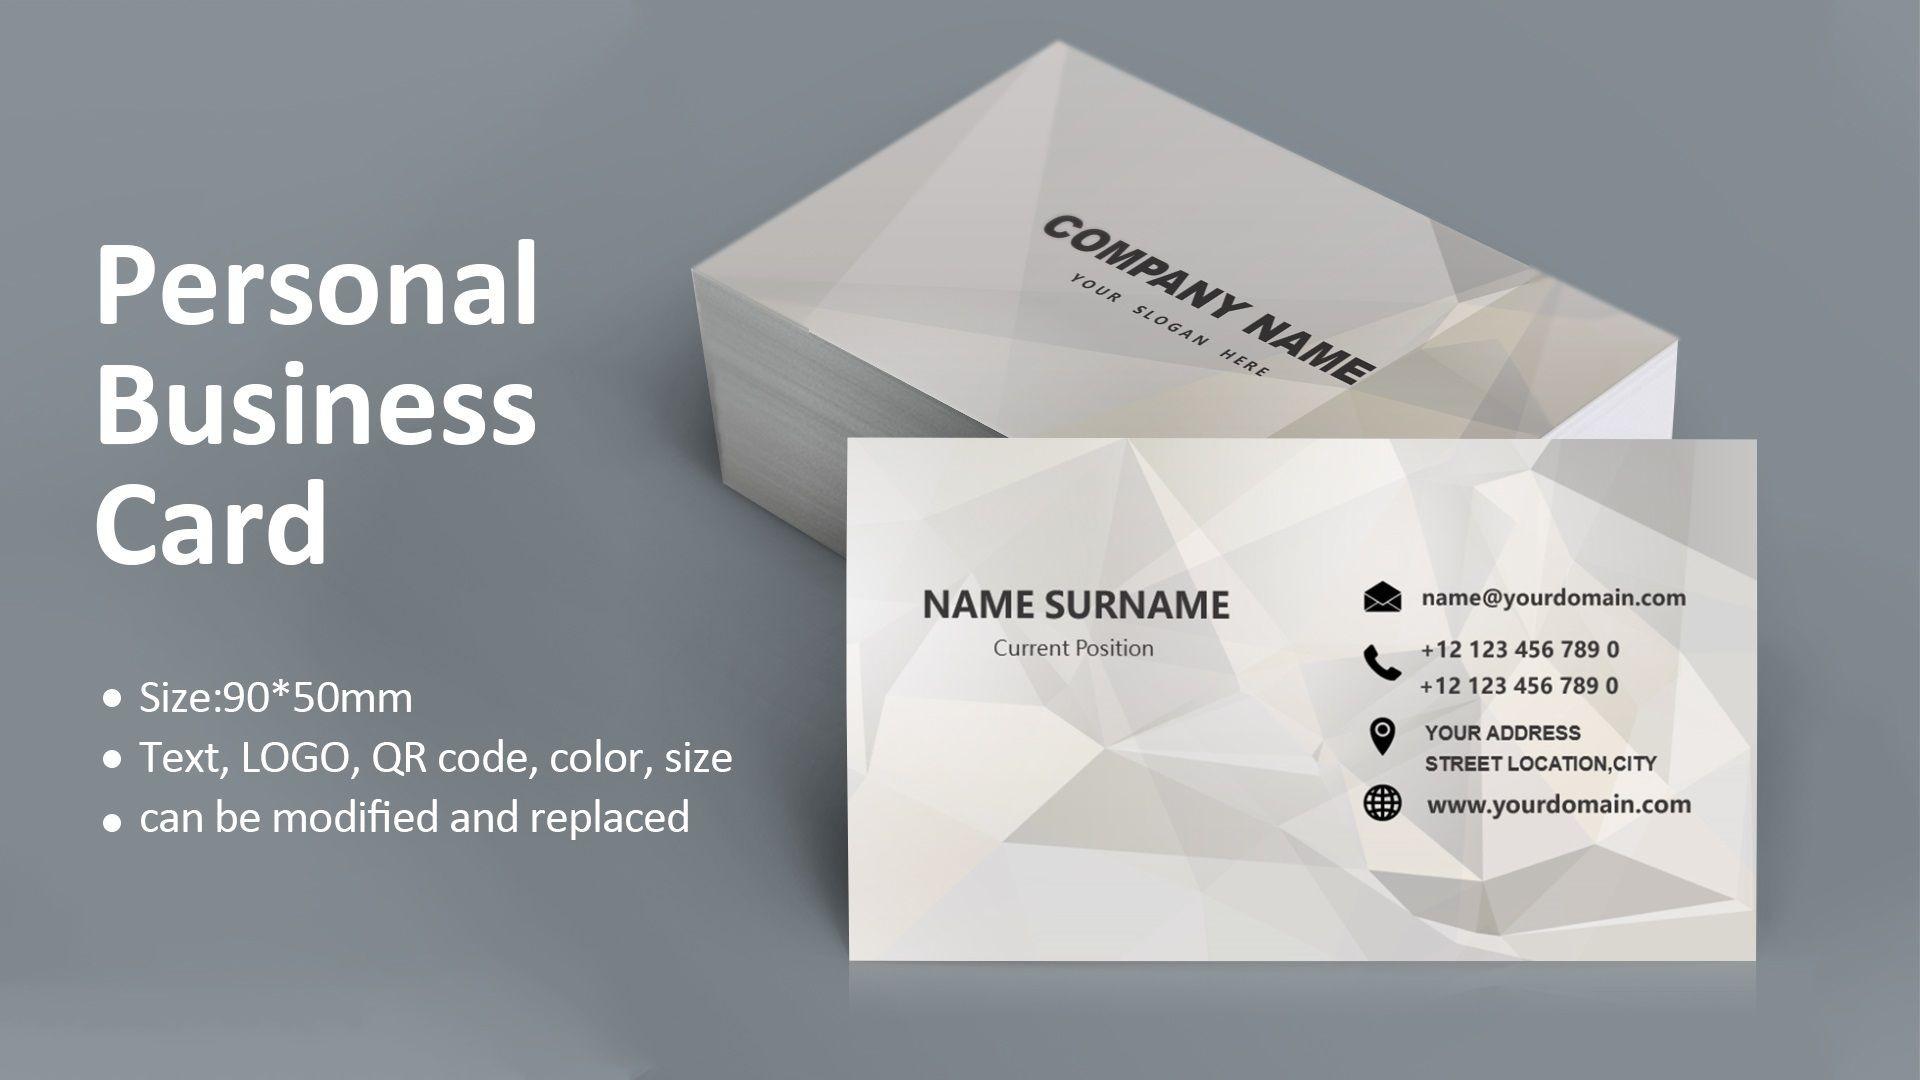 000 Astounding Simple Busines Card Template Free Download Sample  Visiting Design Psd File Minimalist1920